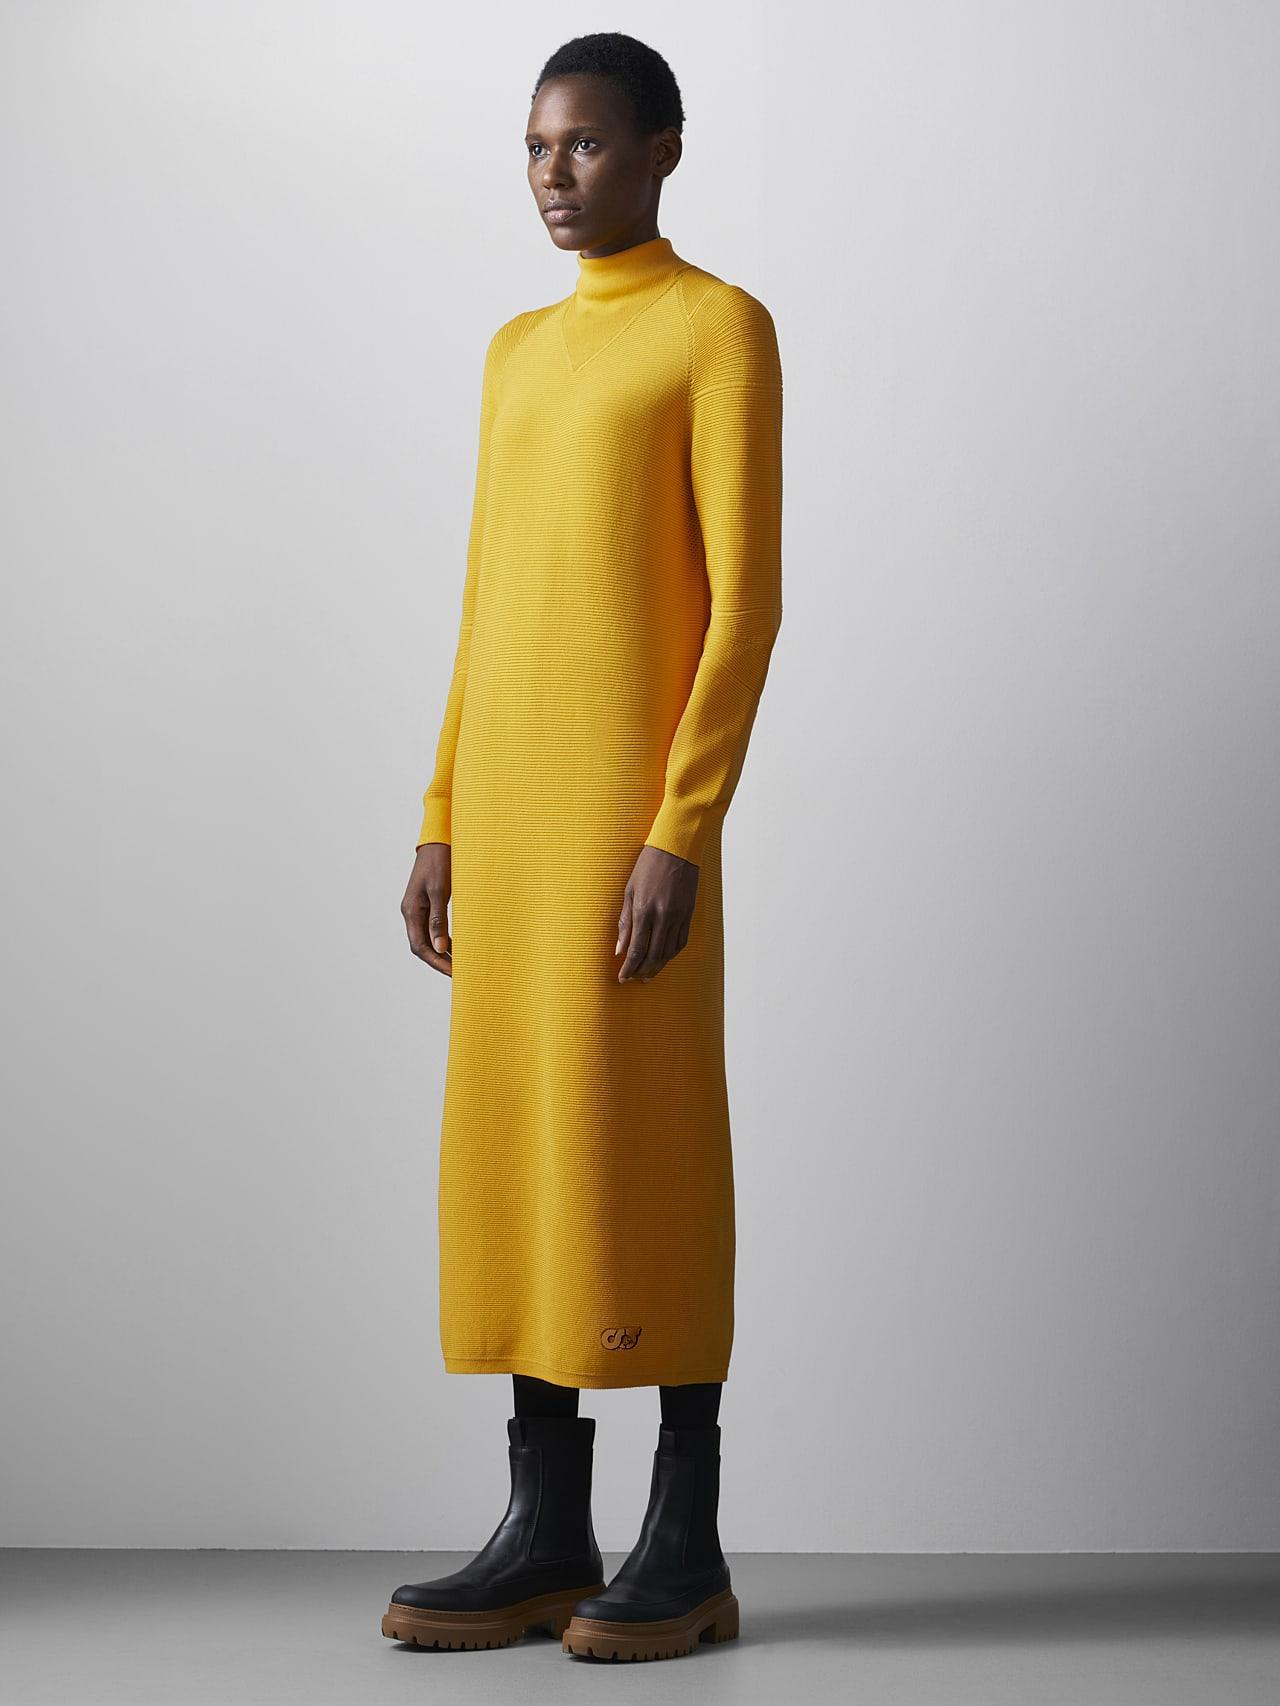 FOXEE V1.Y5.02 Seamless 3D Knit Mock-Neck Dress yellow Model shot Alpha Tauri